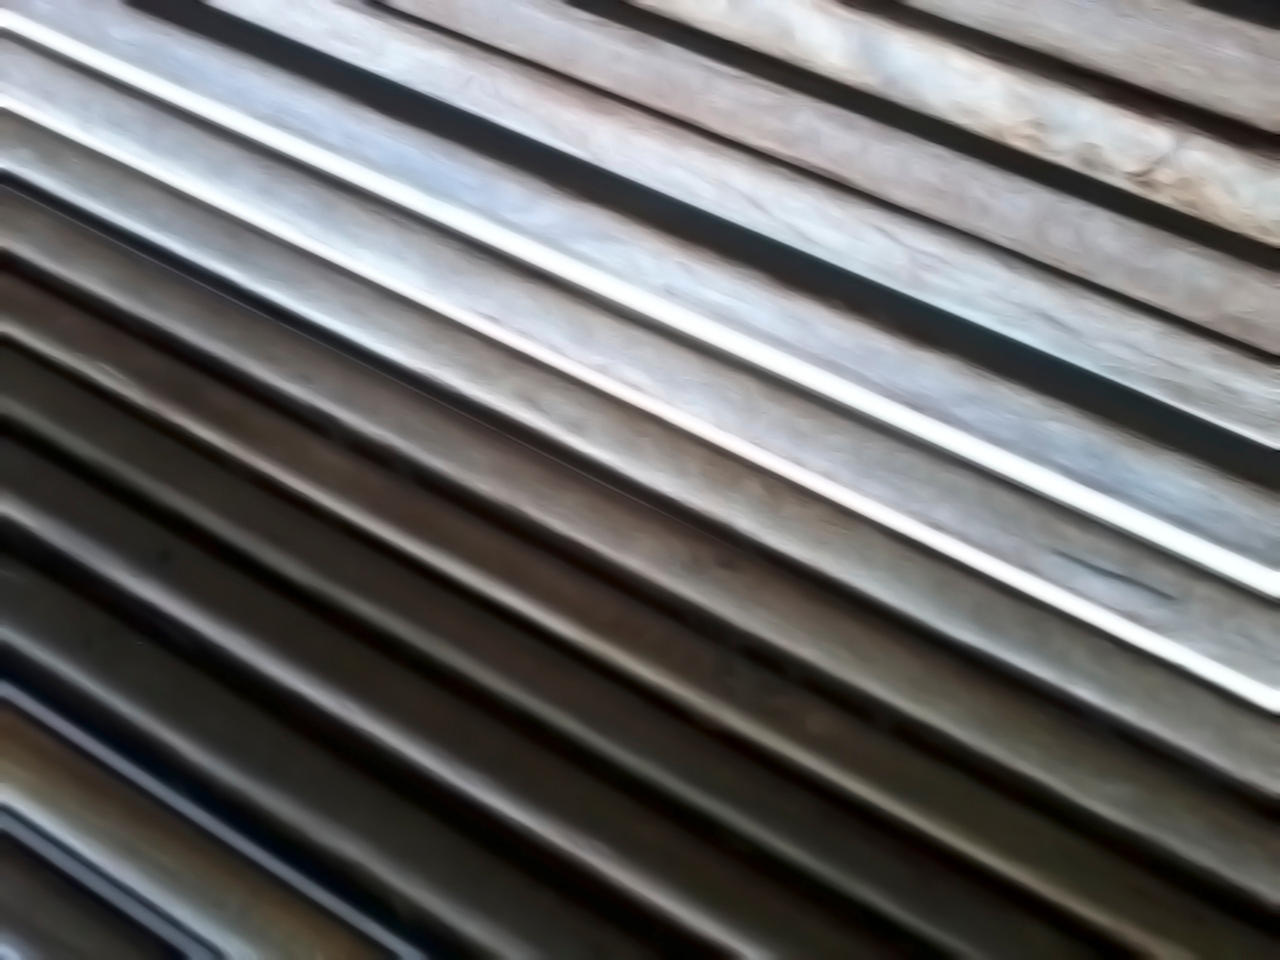 Line Texture : Line texture pattern by donnamarie on deviantart